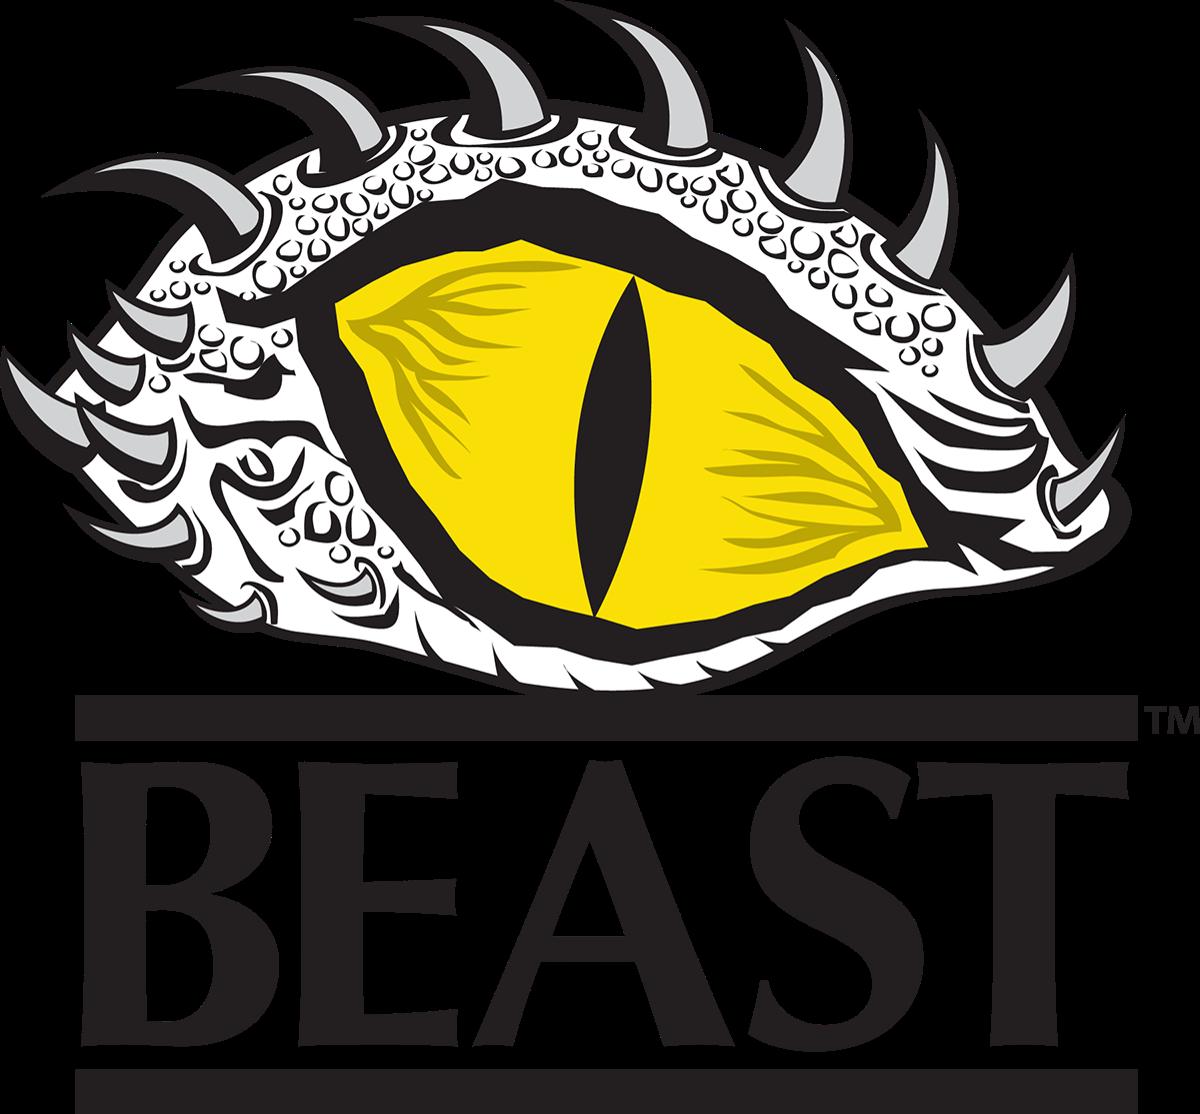 Beast_logo.png